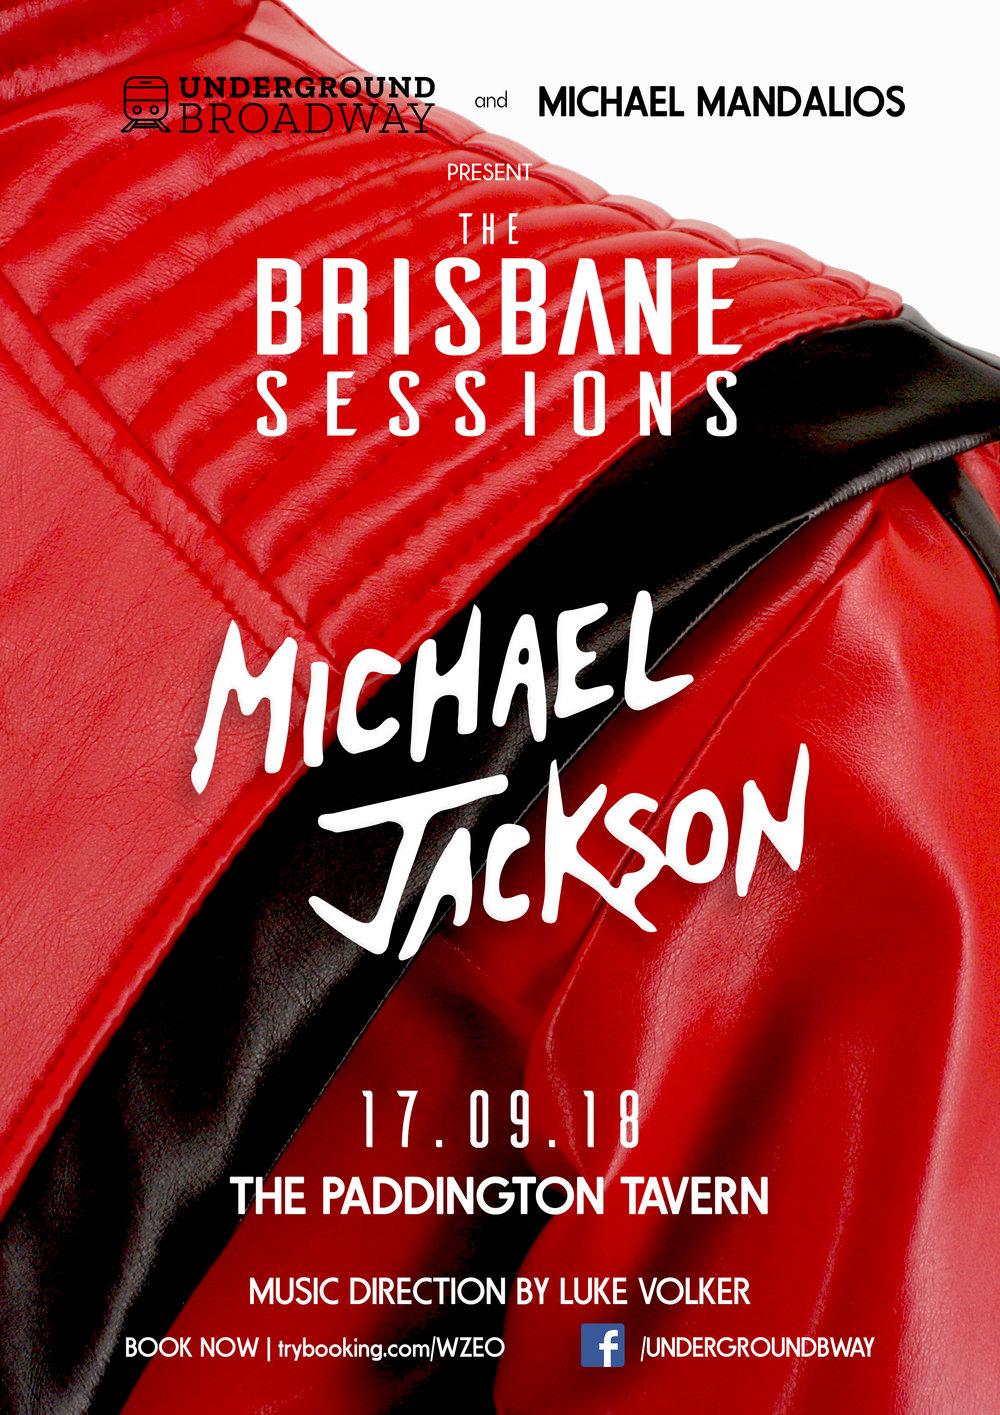 MJ Sessions Poster.jpg